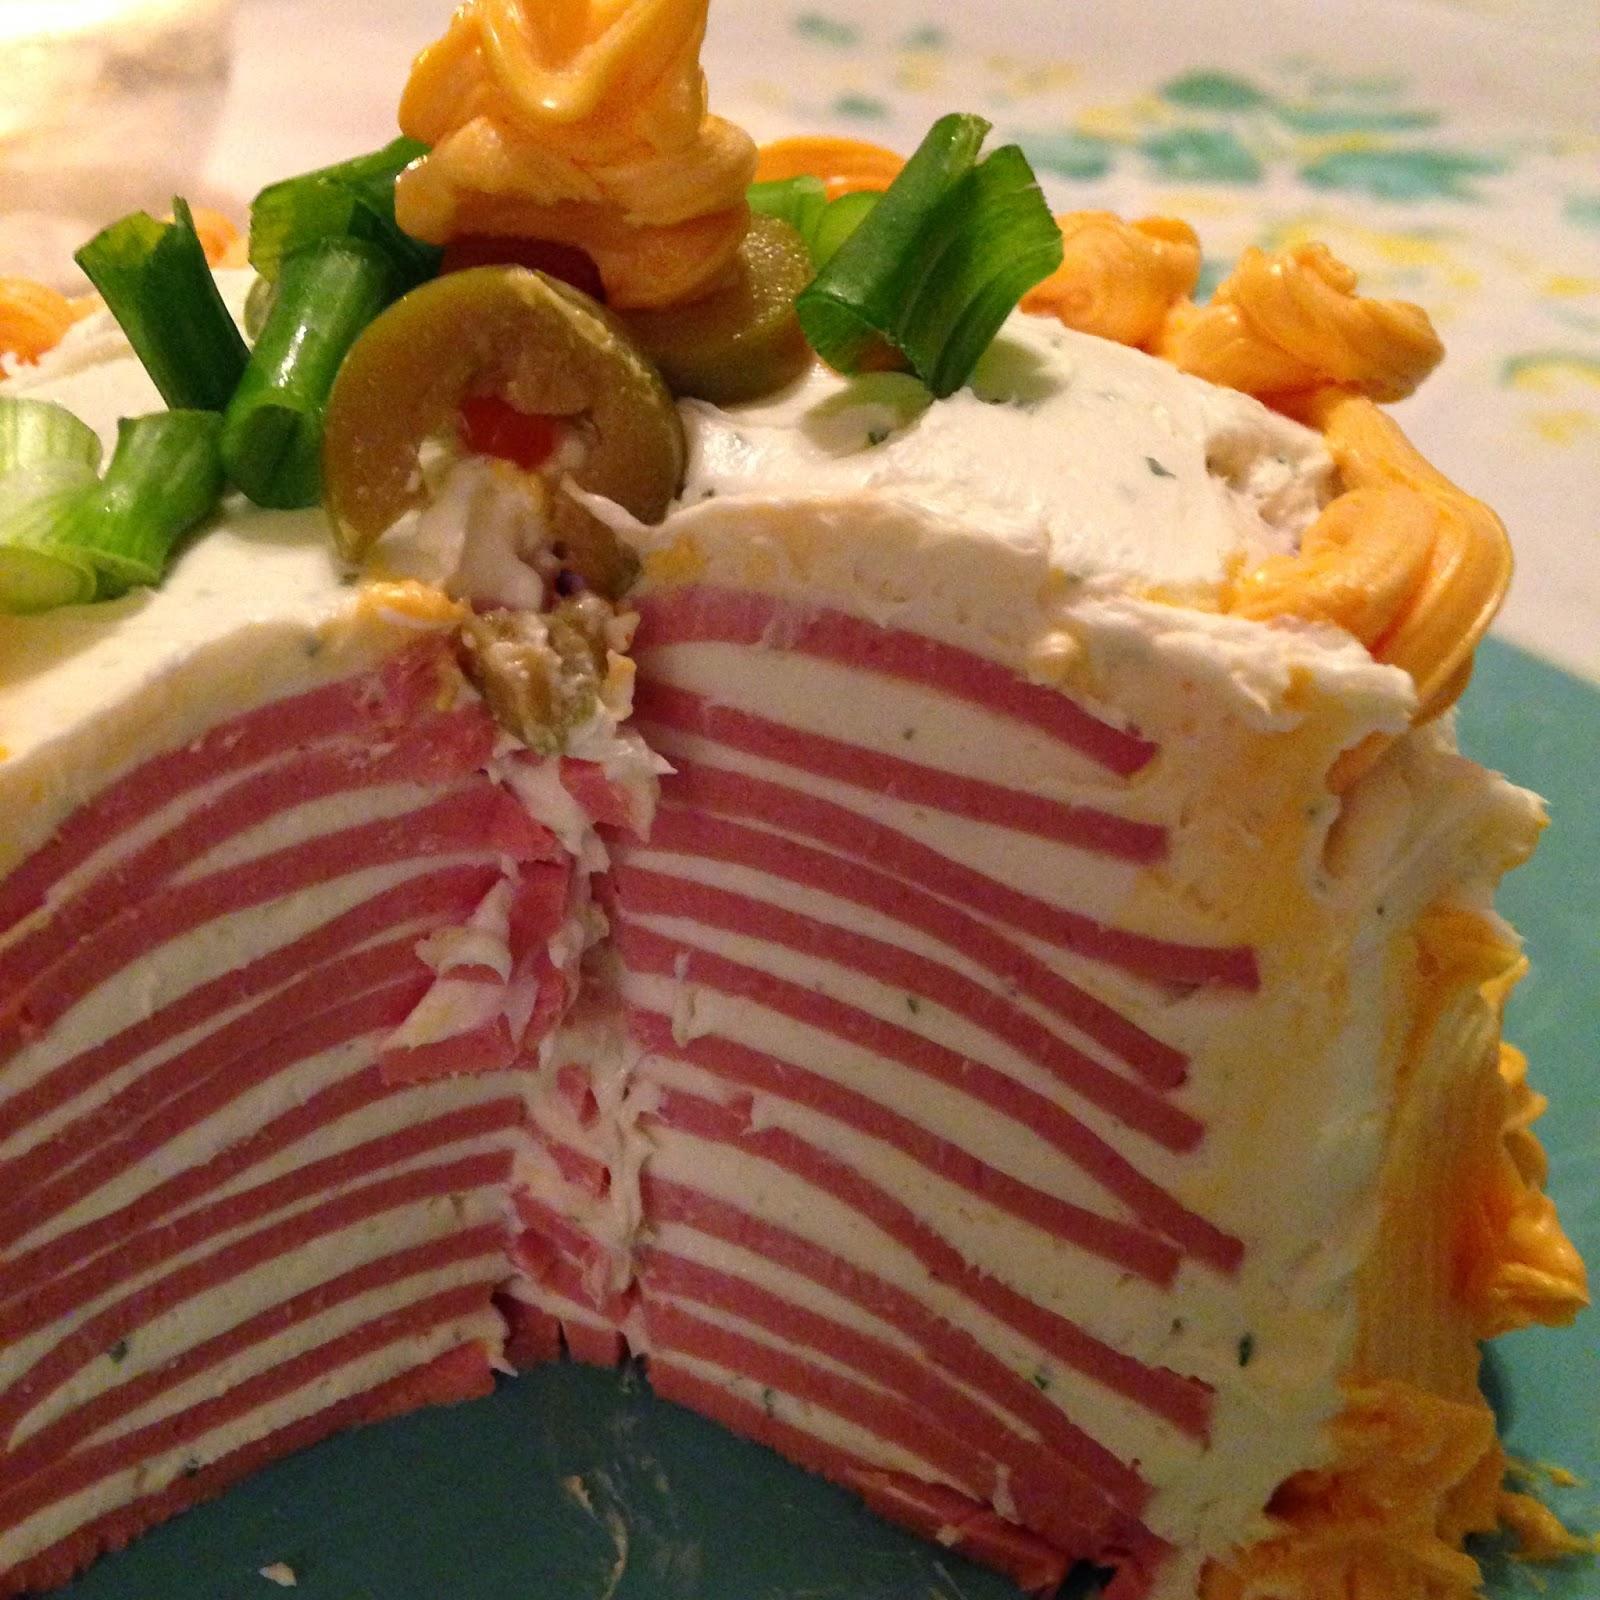 b and b adriano bologna cake - photo#4